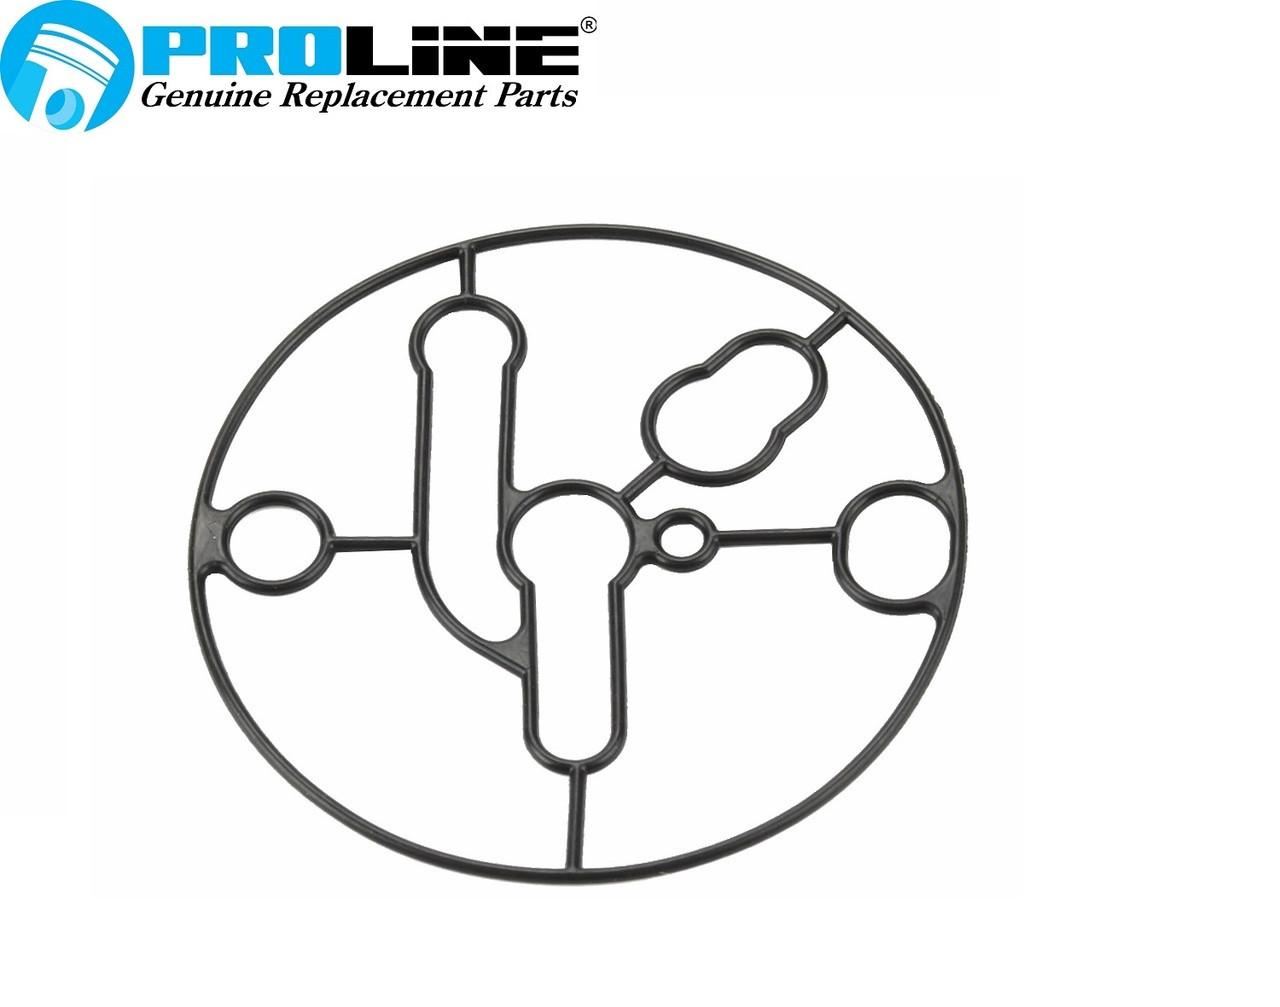 Proline® Carburetor Bowl Gasket For Briggs & Stratton